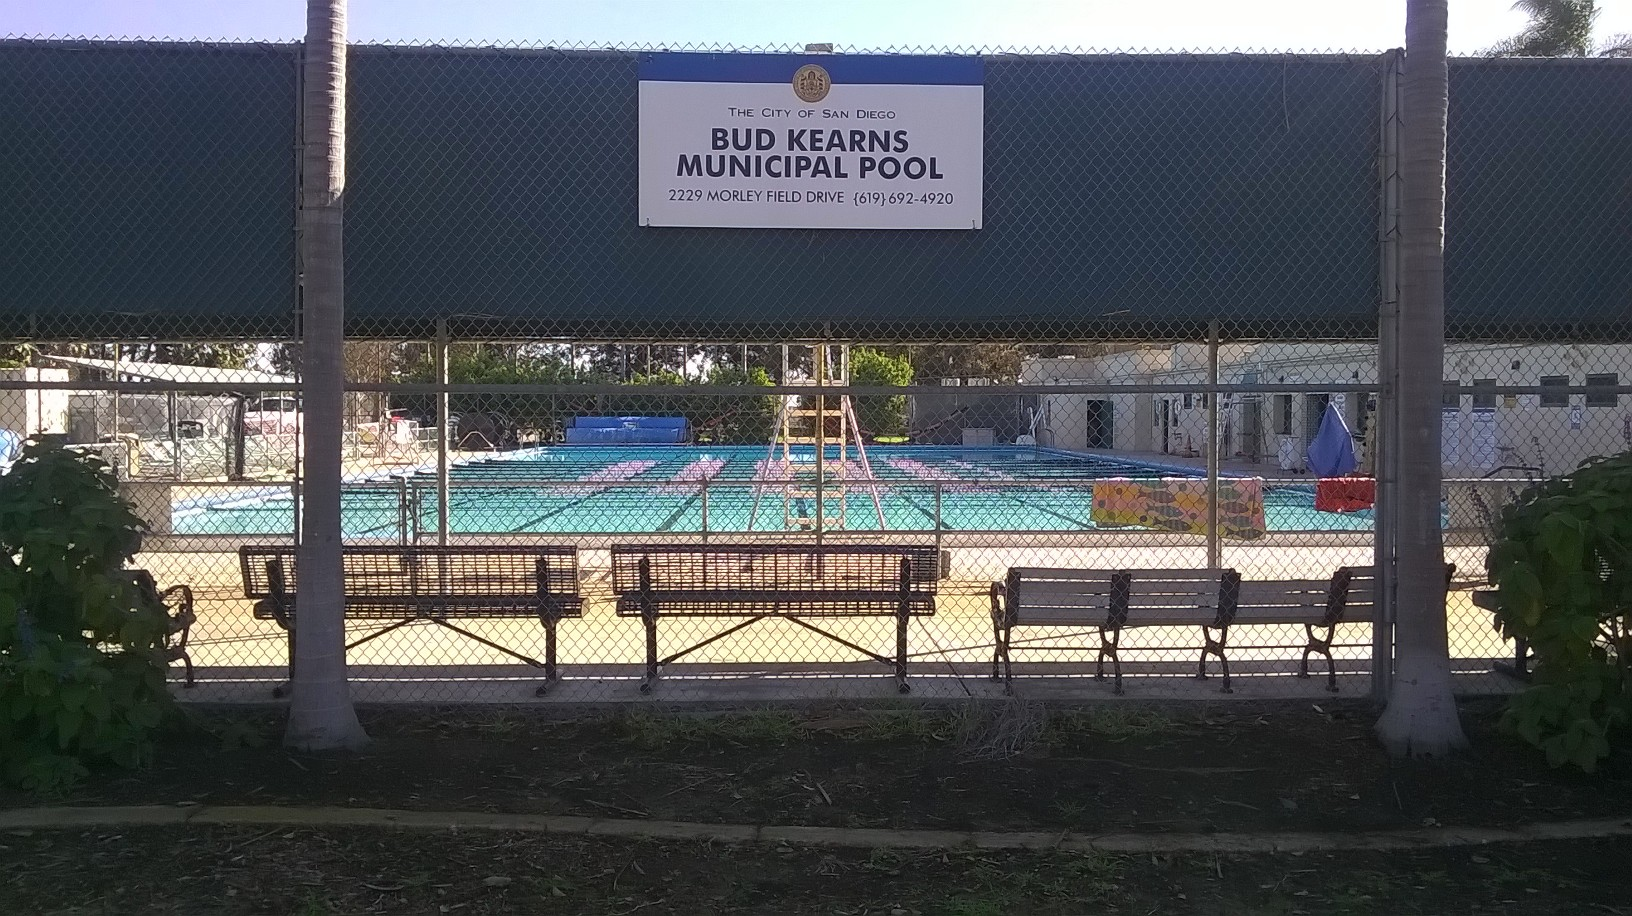 Bud Kearns Municipal (San Diego)